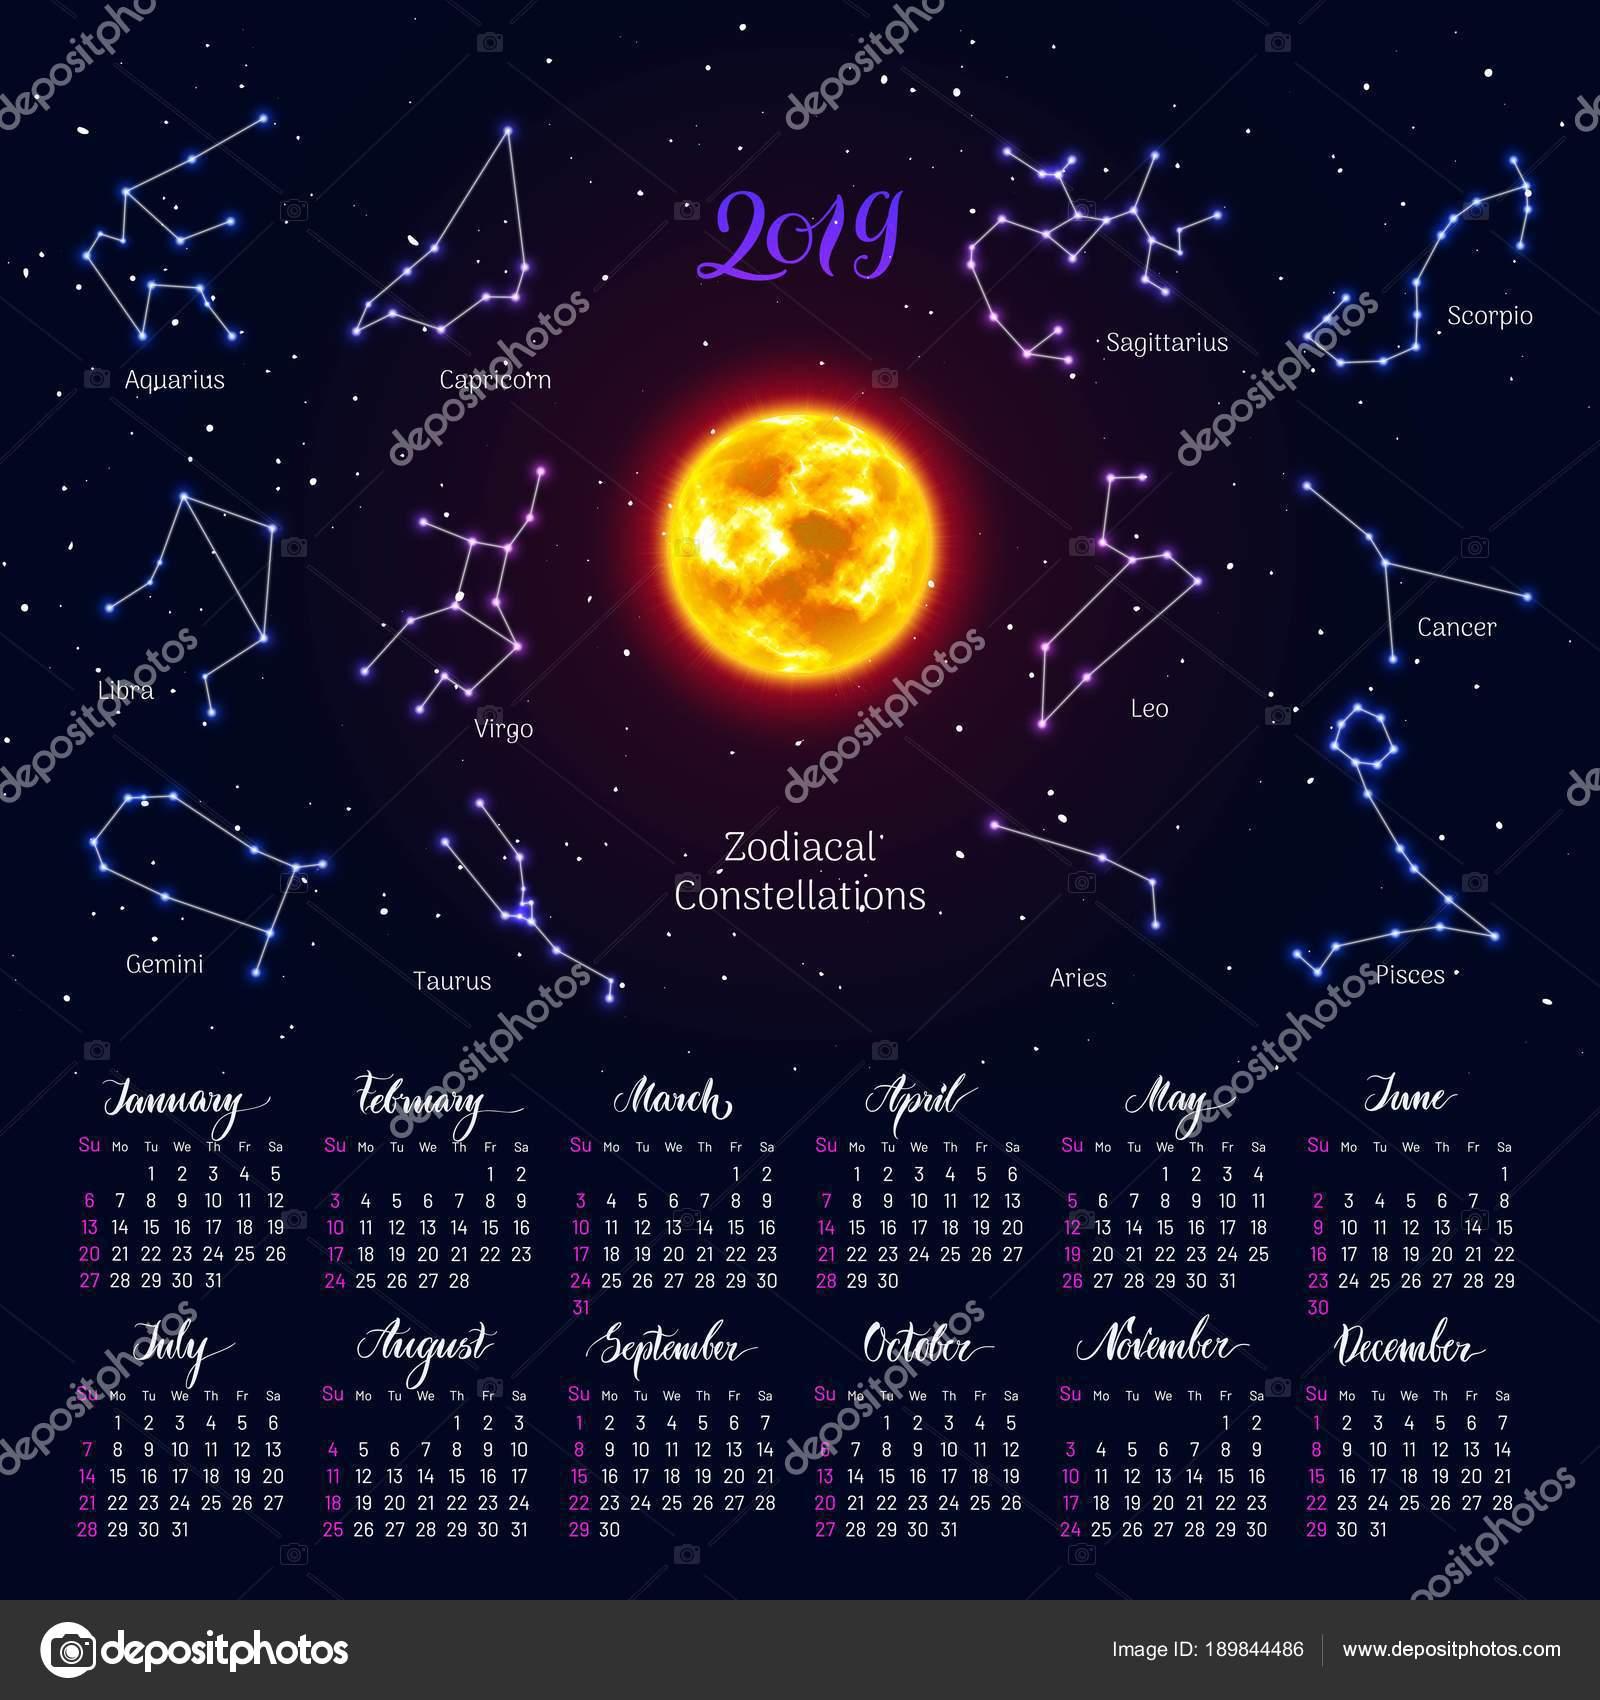 Zodiac Calendar 2019 Calendar, sun, zodiac signs, 2019, night sky background, lettering